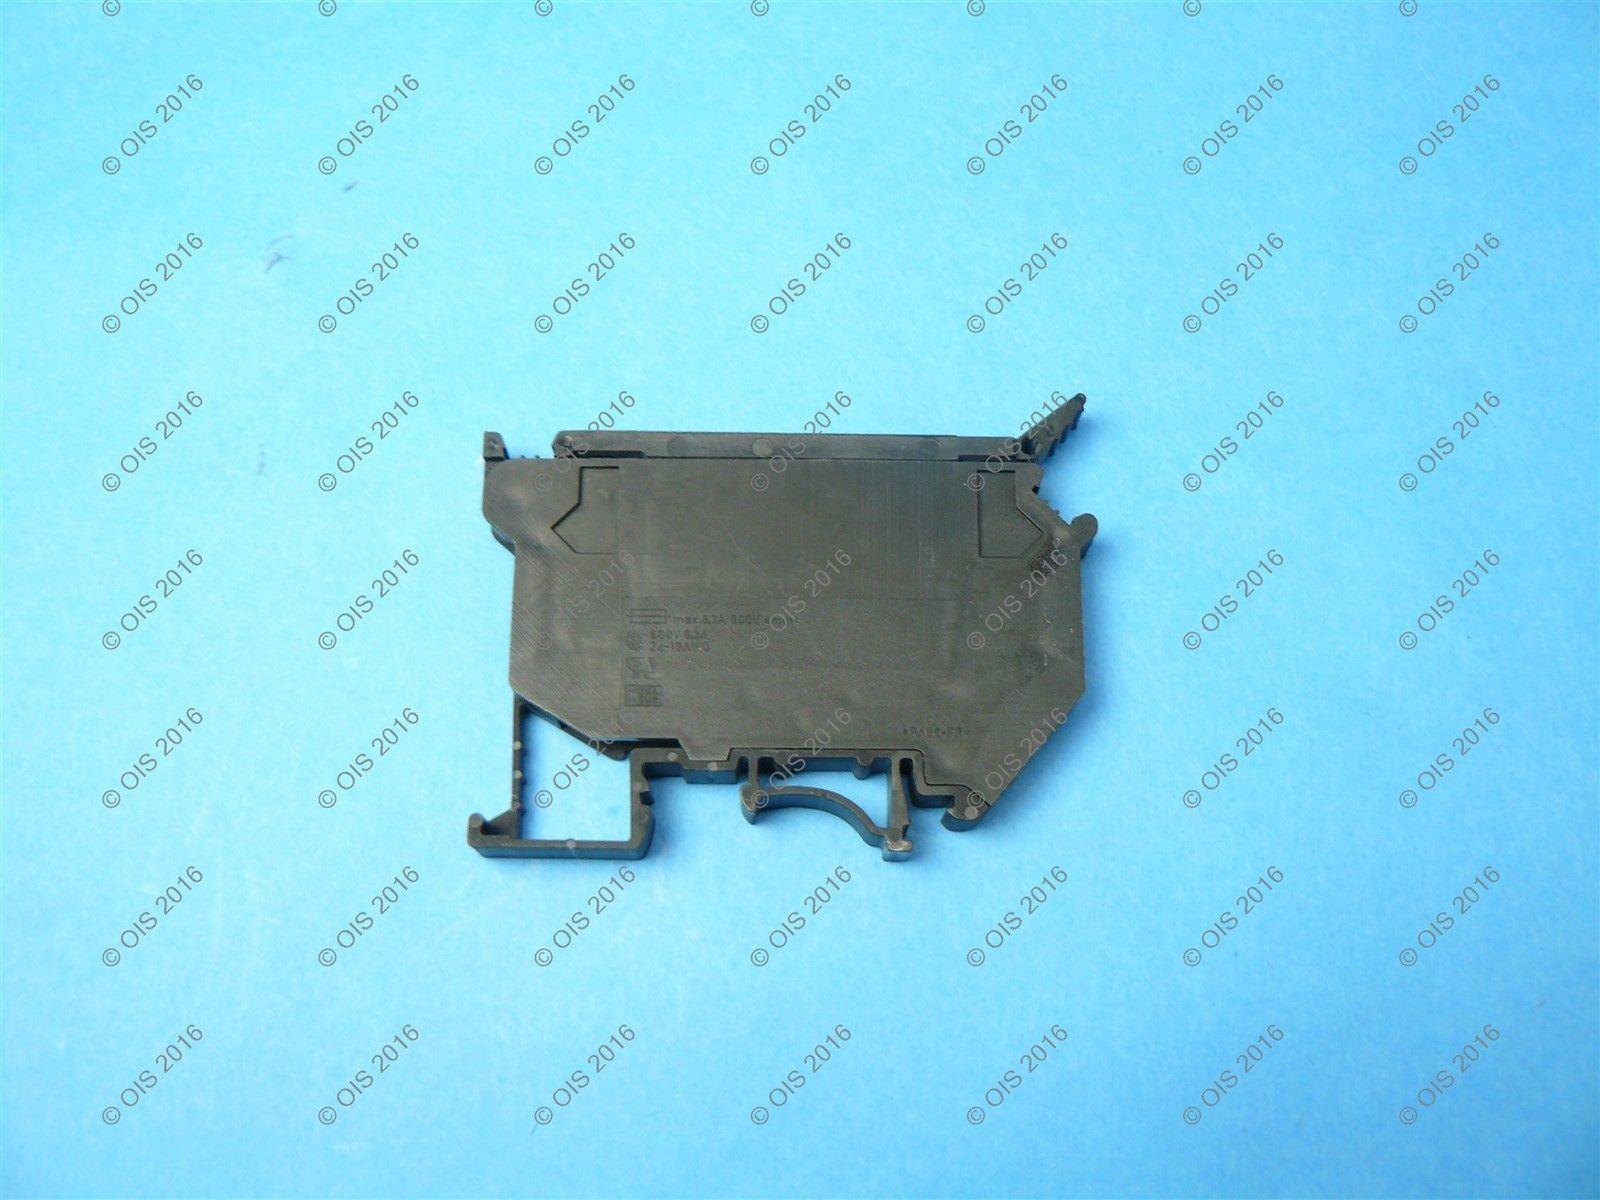 New Old Stock Ferraz Shawmut Ultrasafe 600v 30A US3J2 Fuse Block Holder